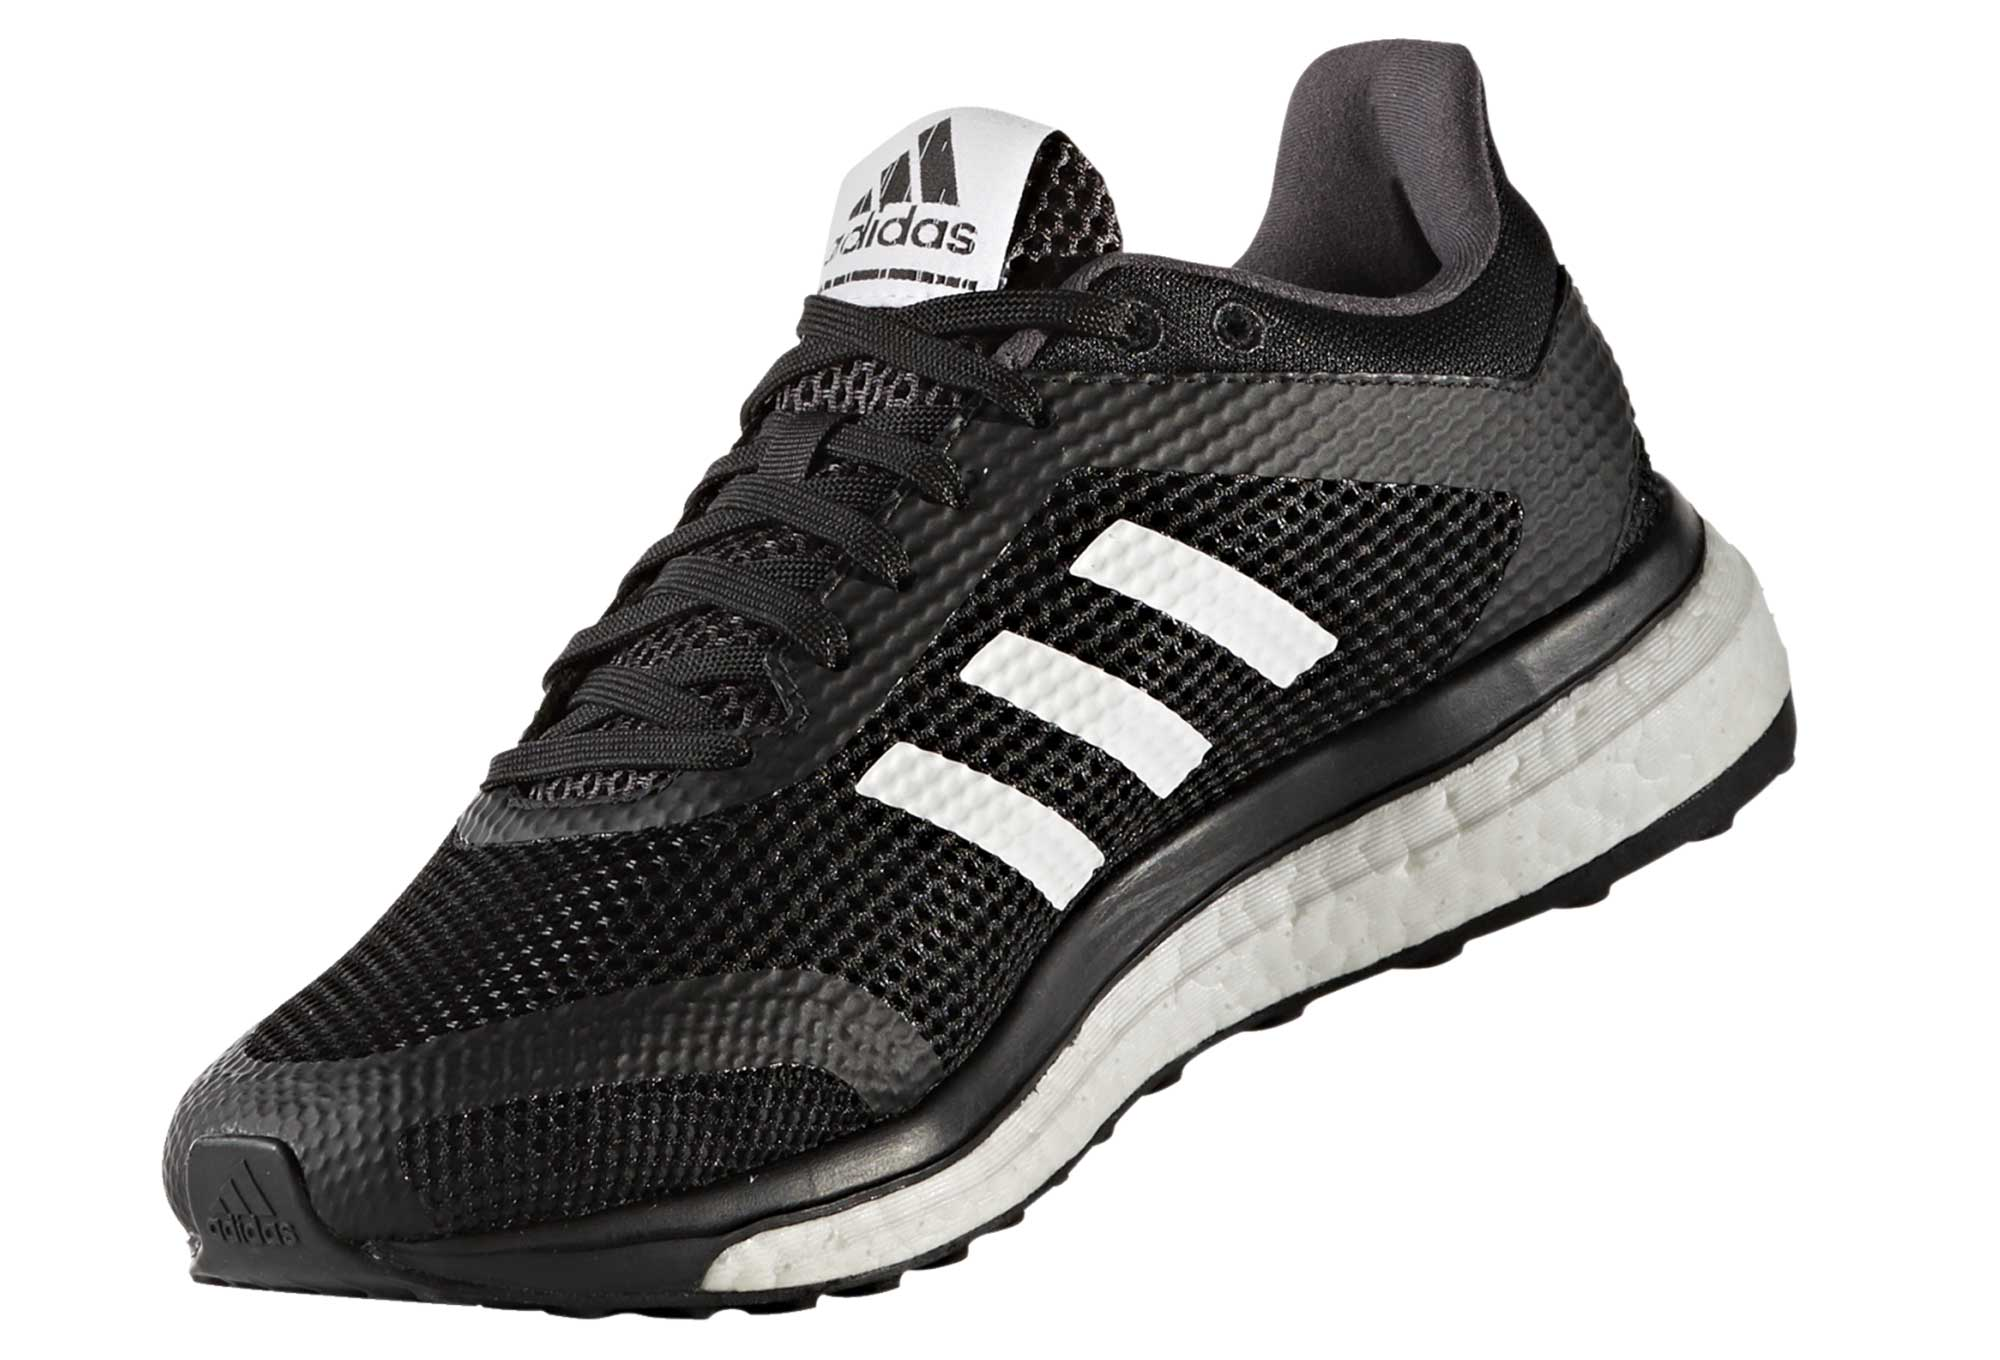 Hommes Chaussures de Running Adidas Response Plus Black